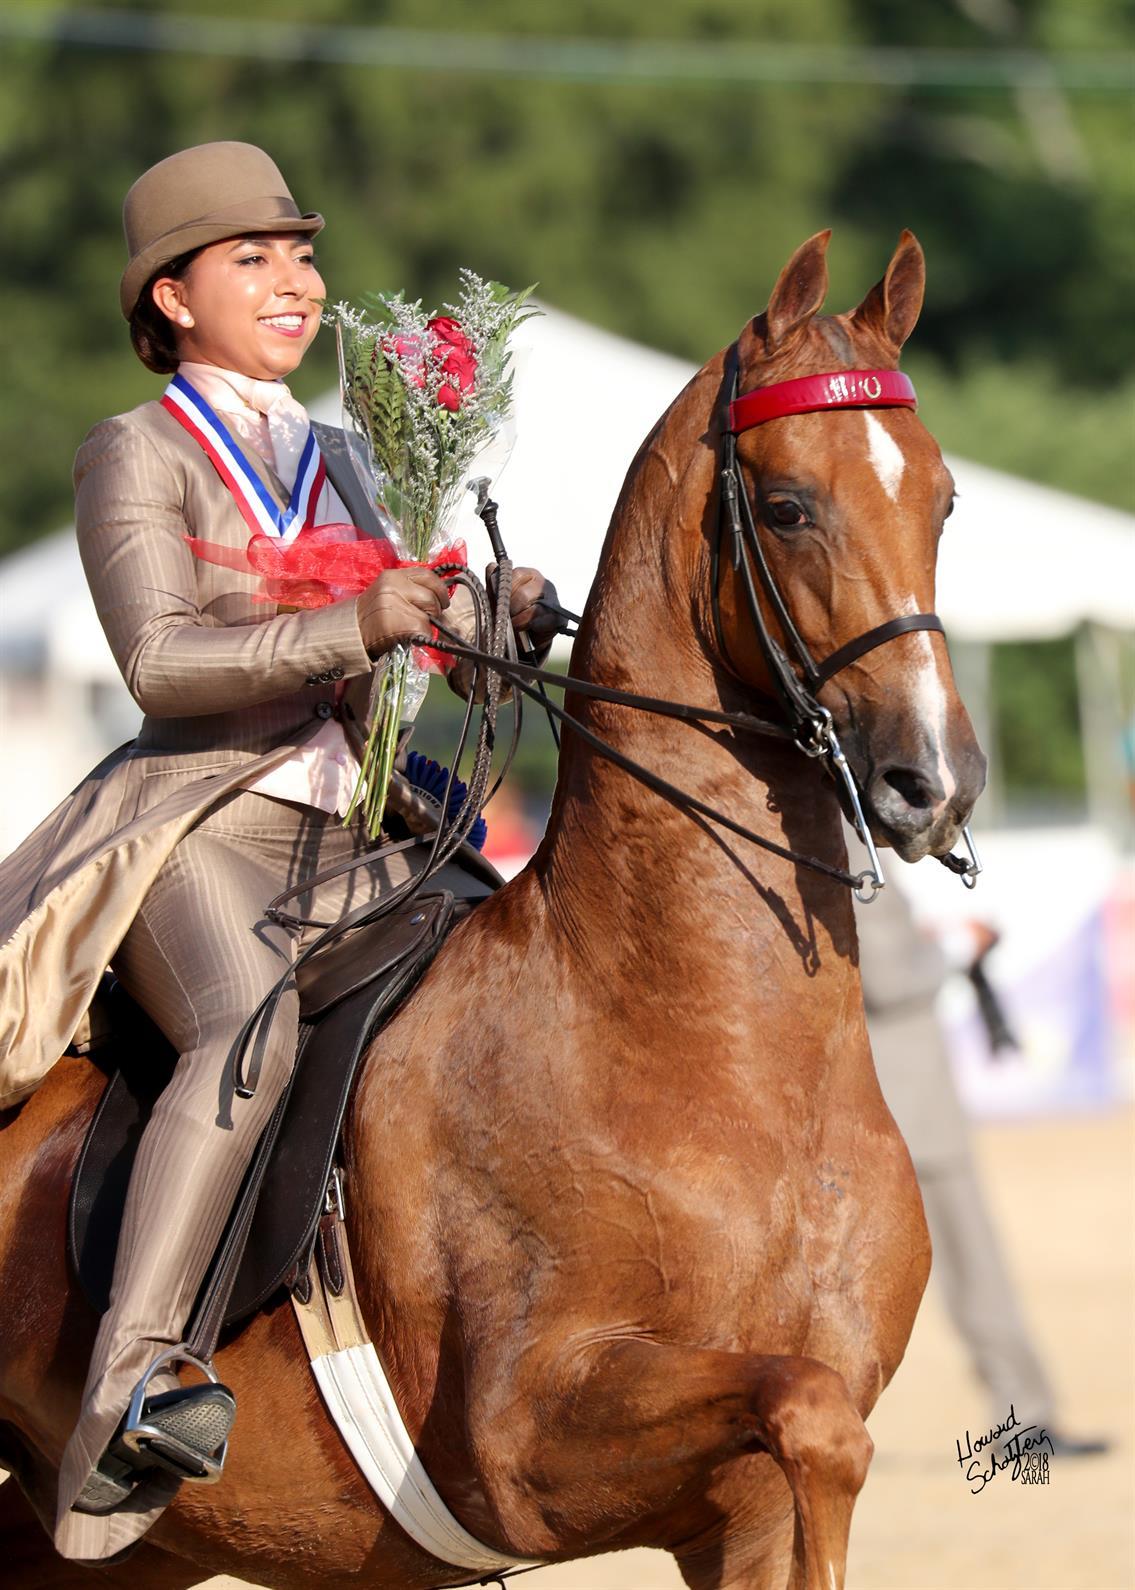 Walz Unanimously Crowned 2018 Usef Saddle Seat Adult Amateur Medal